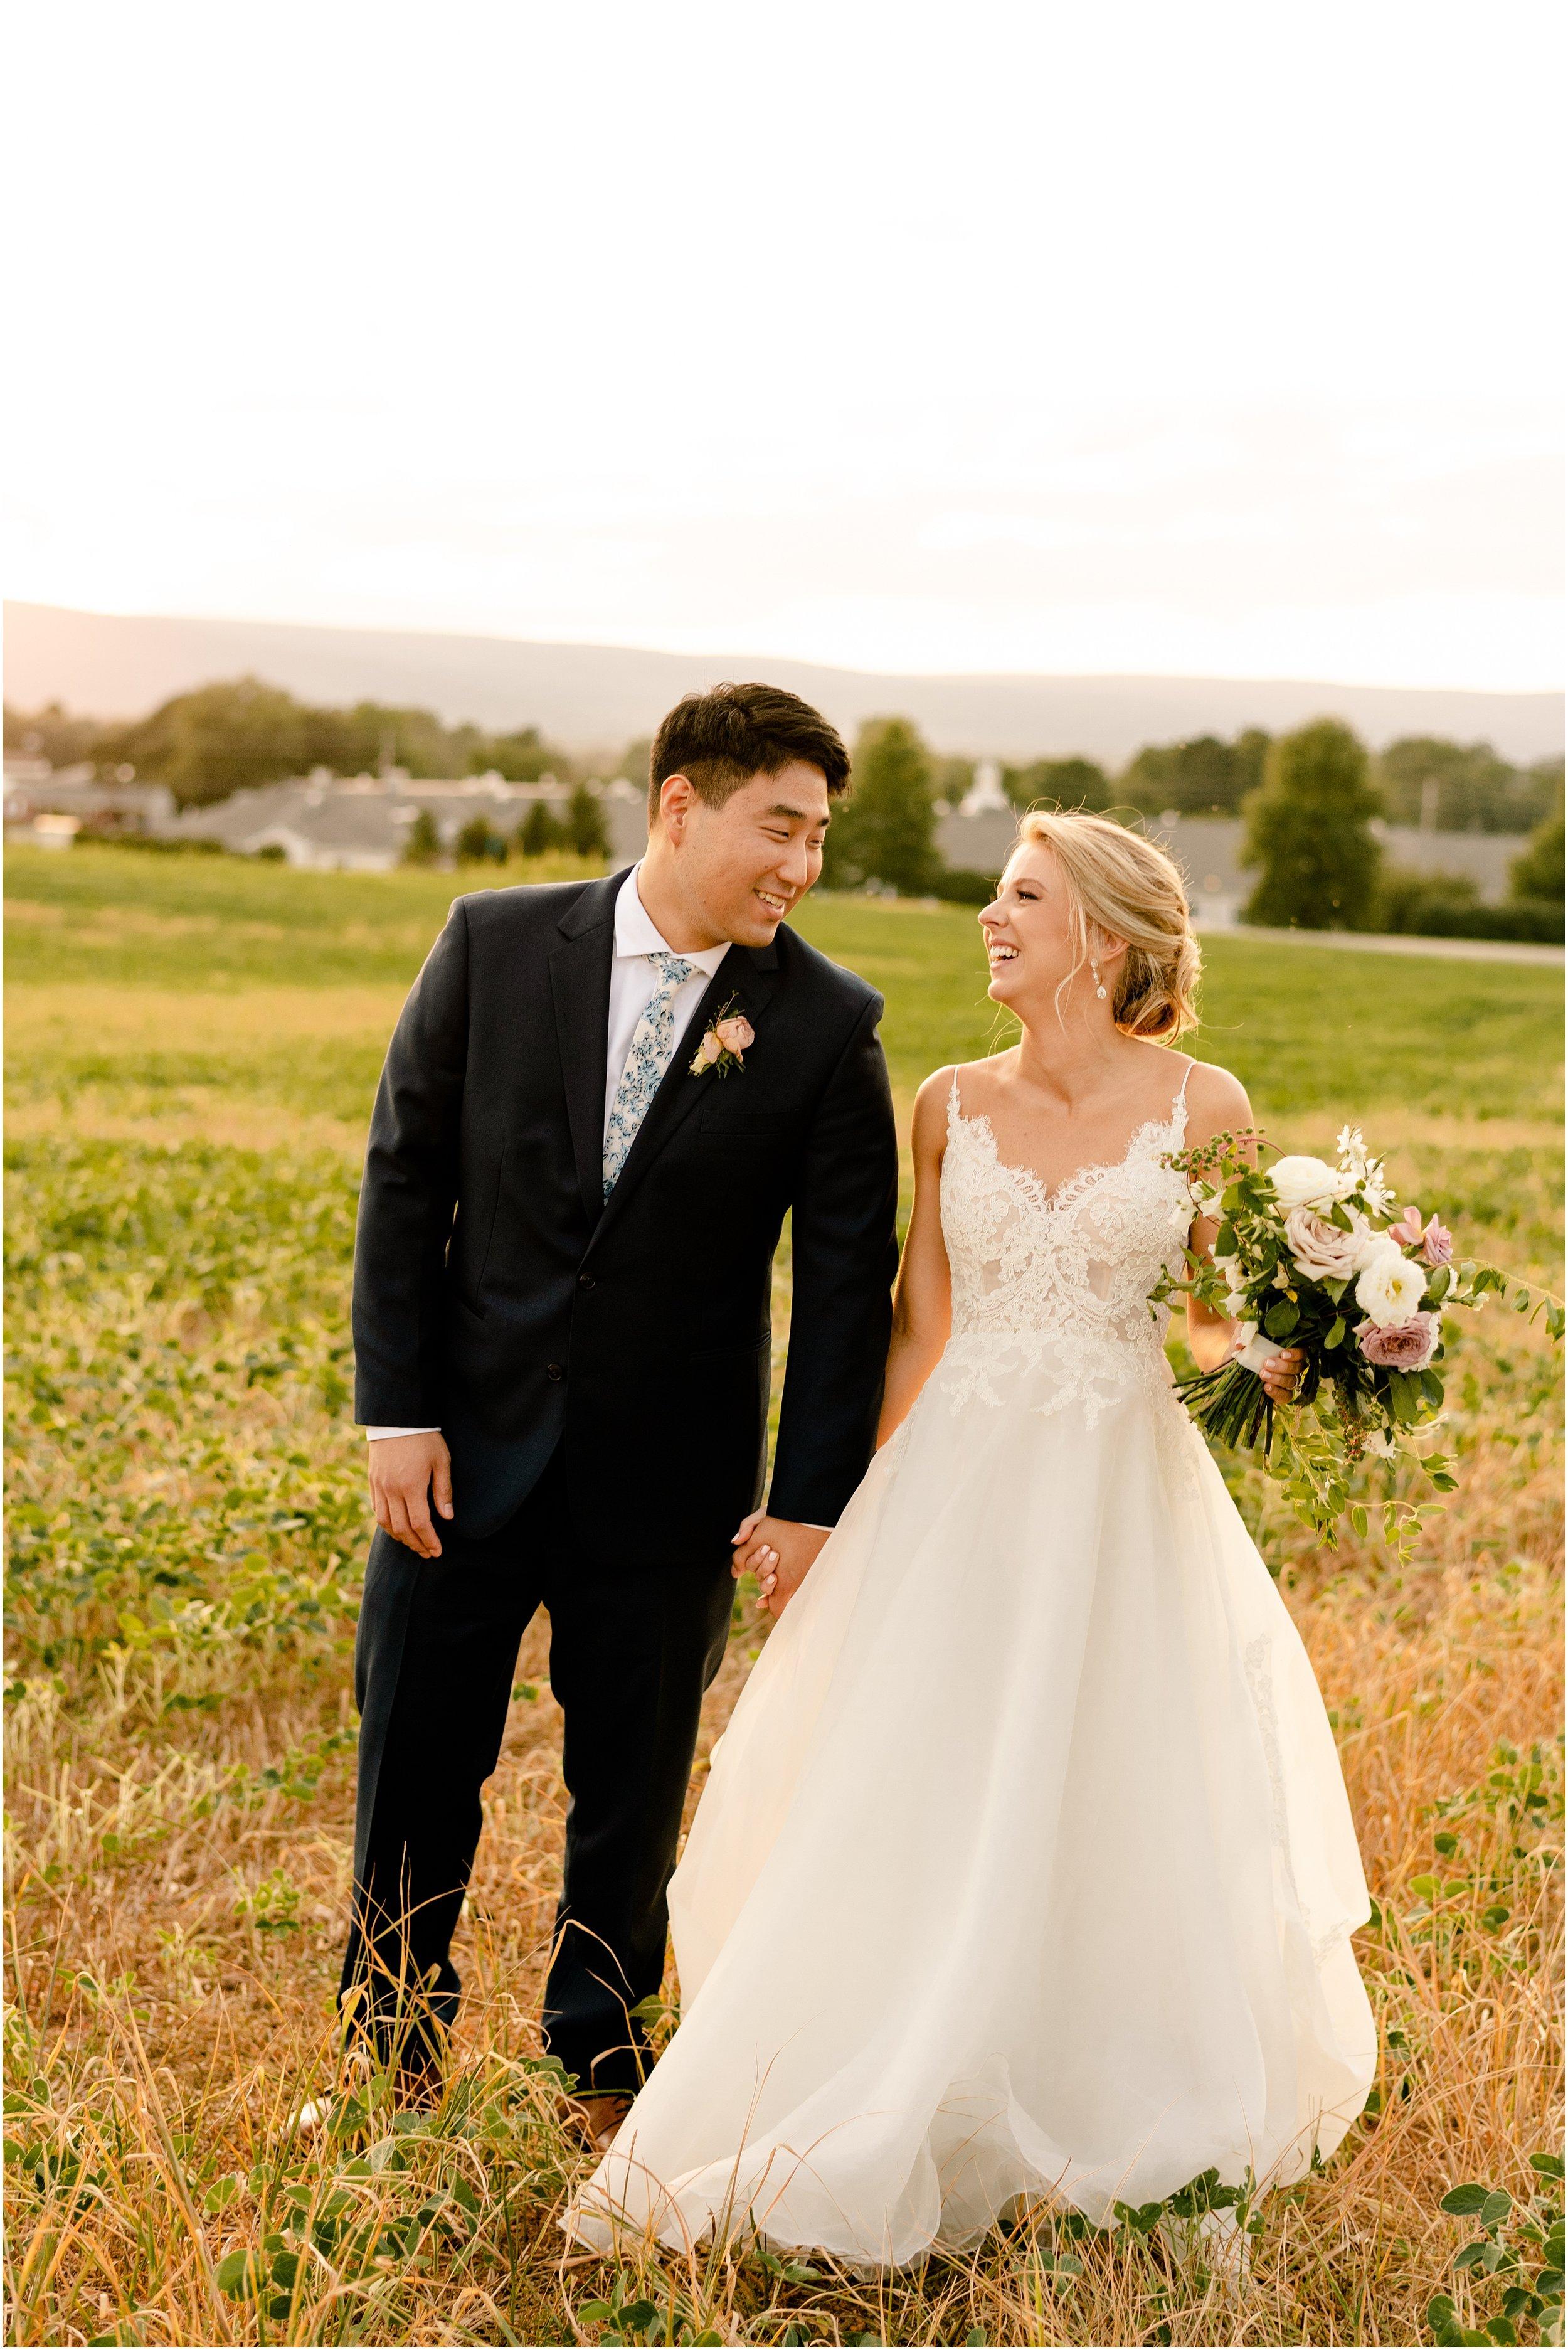 hannah leigh photography Walkers Overlook Wedding Walkersville MD_3554.jpg